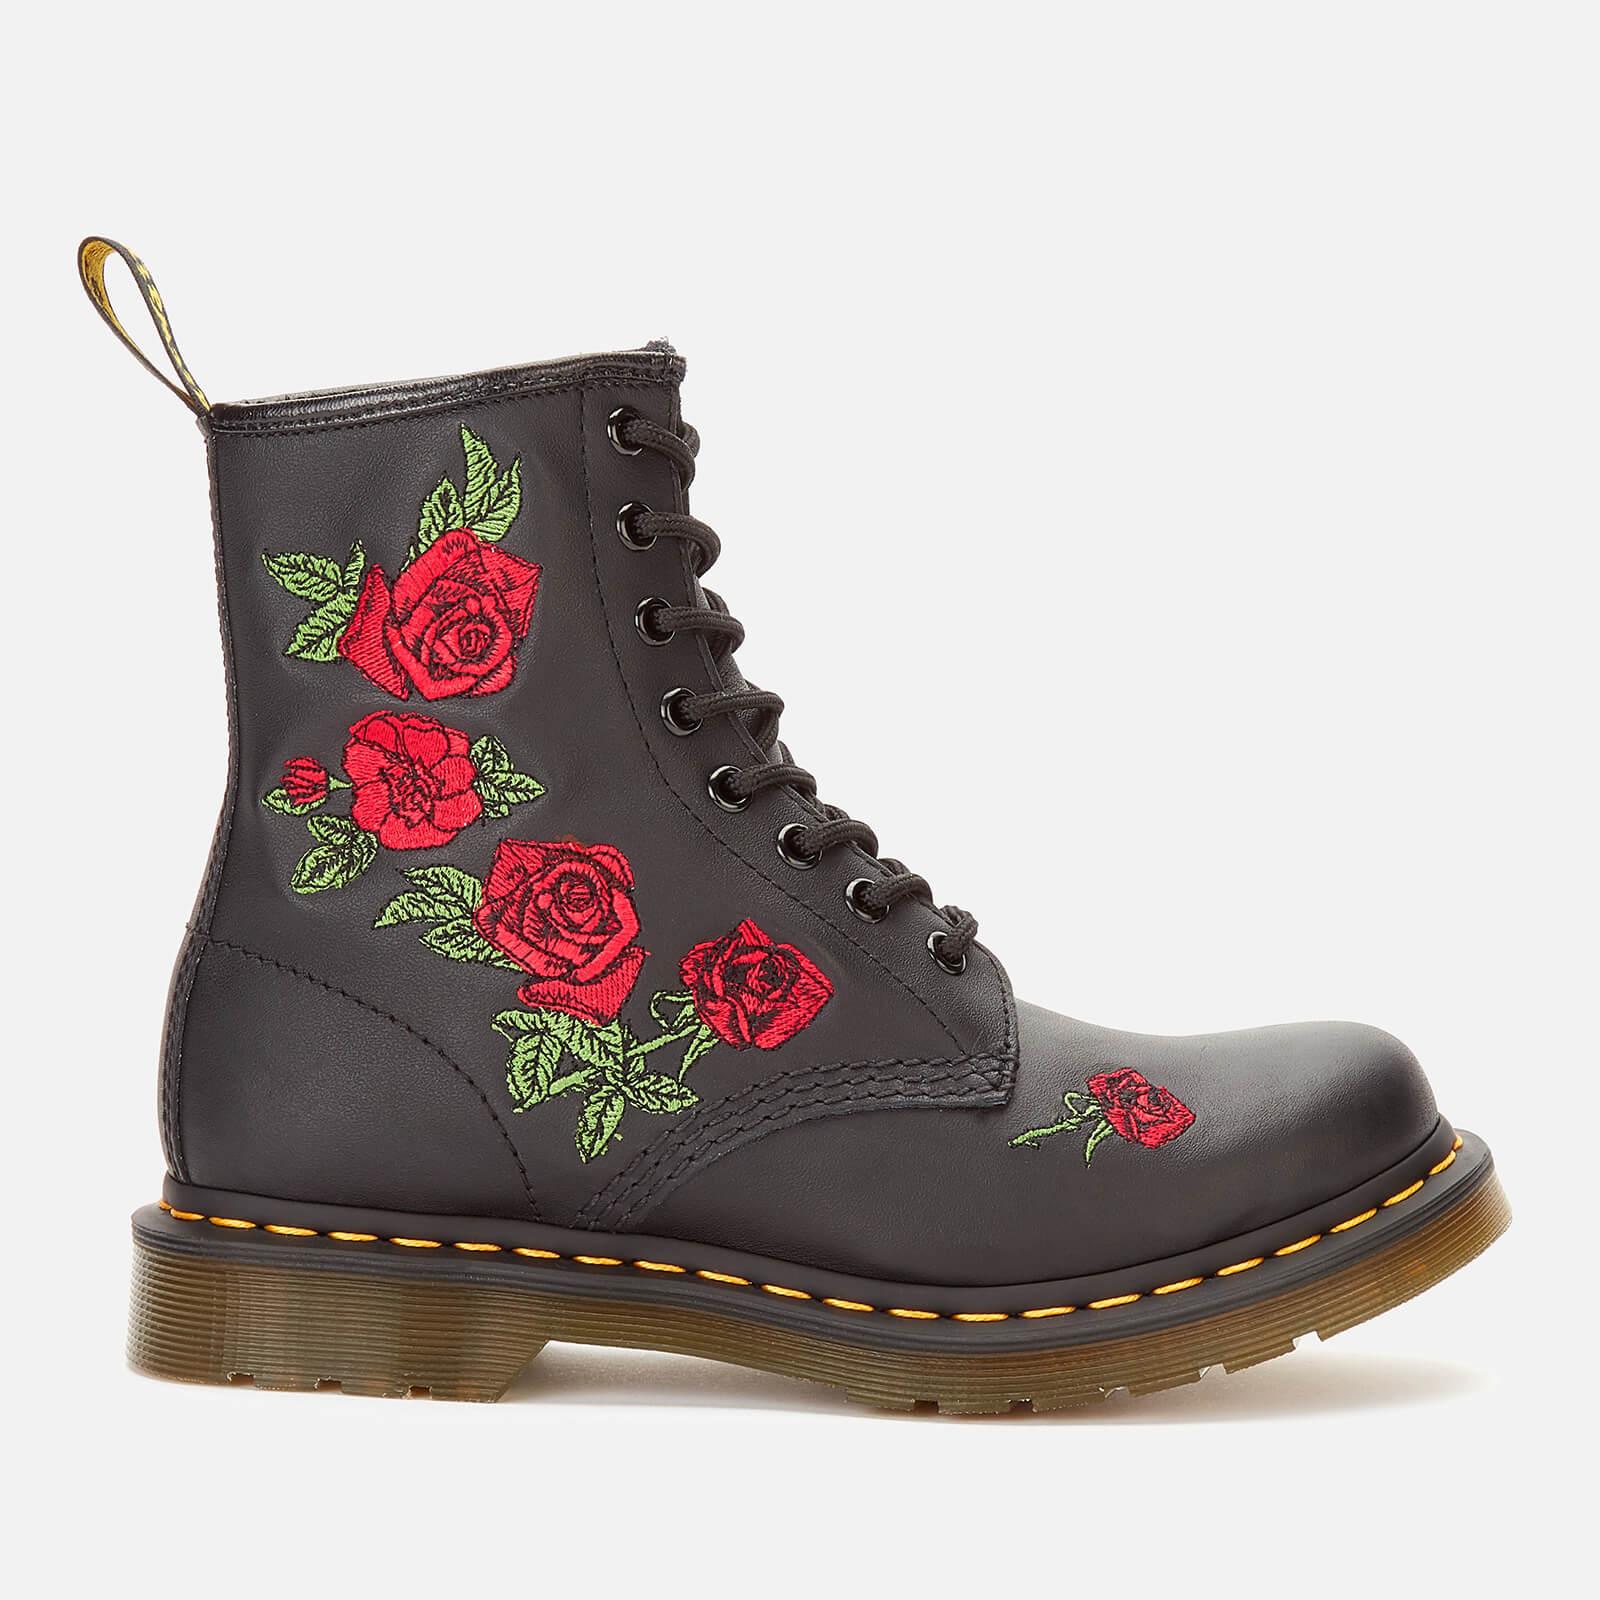 Dr. Martens Women's 1460 Vonda Softy T Leather 8-Eye Boots - Black - UK 6